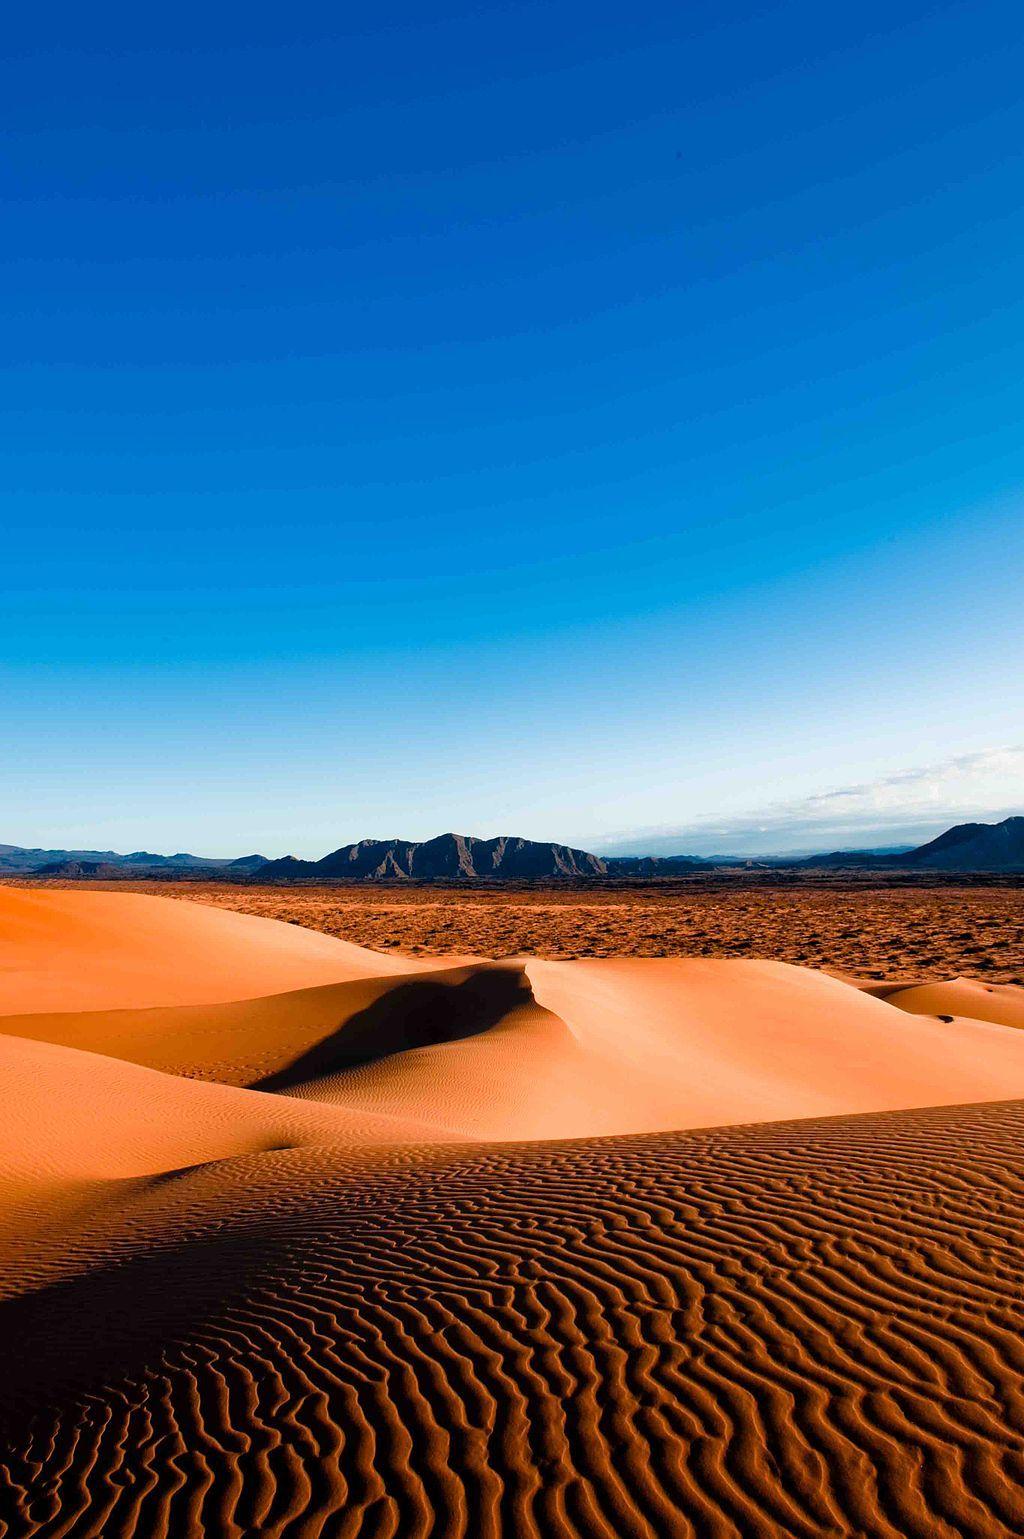 View of Desert Terrain